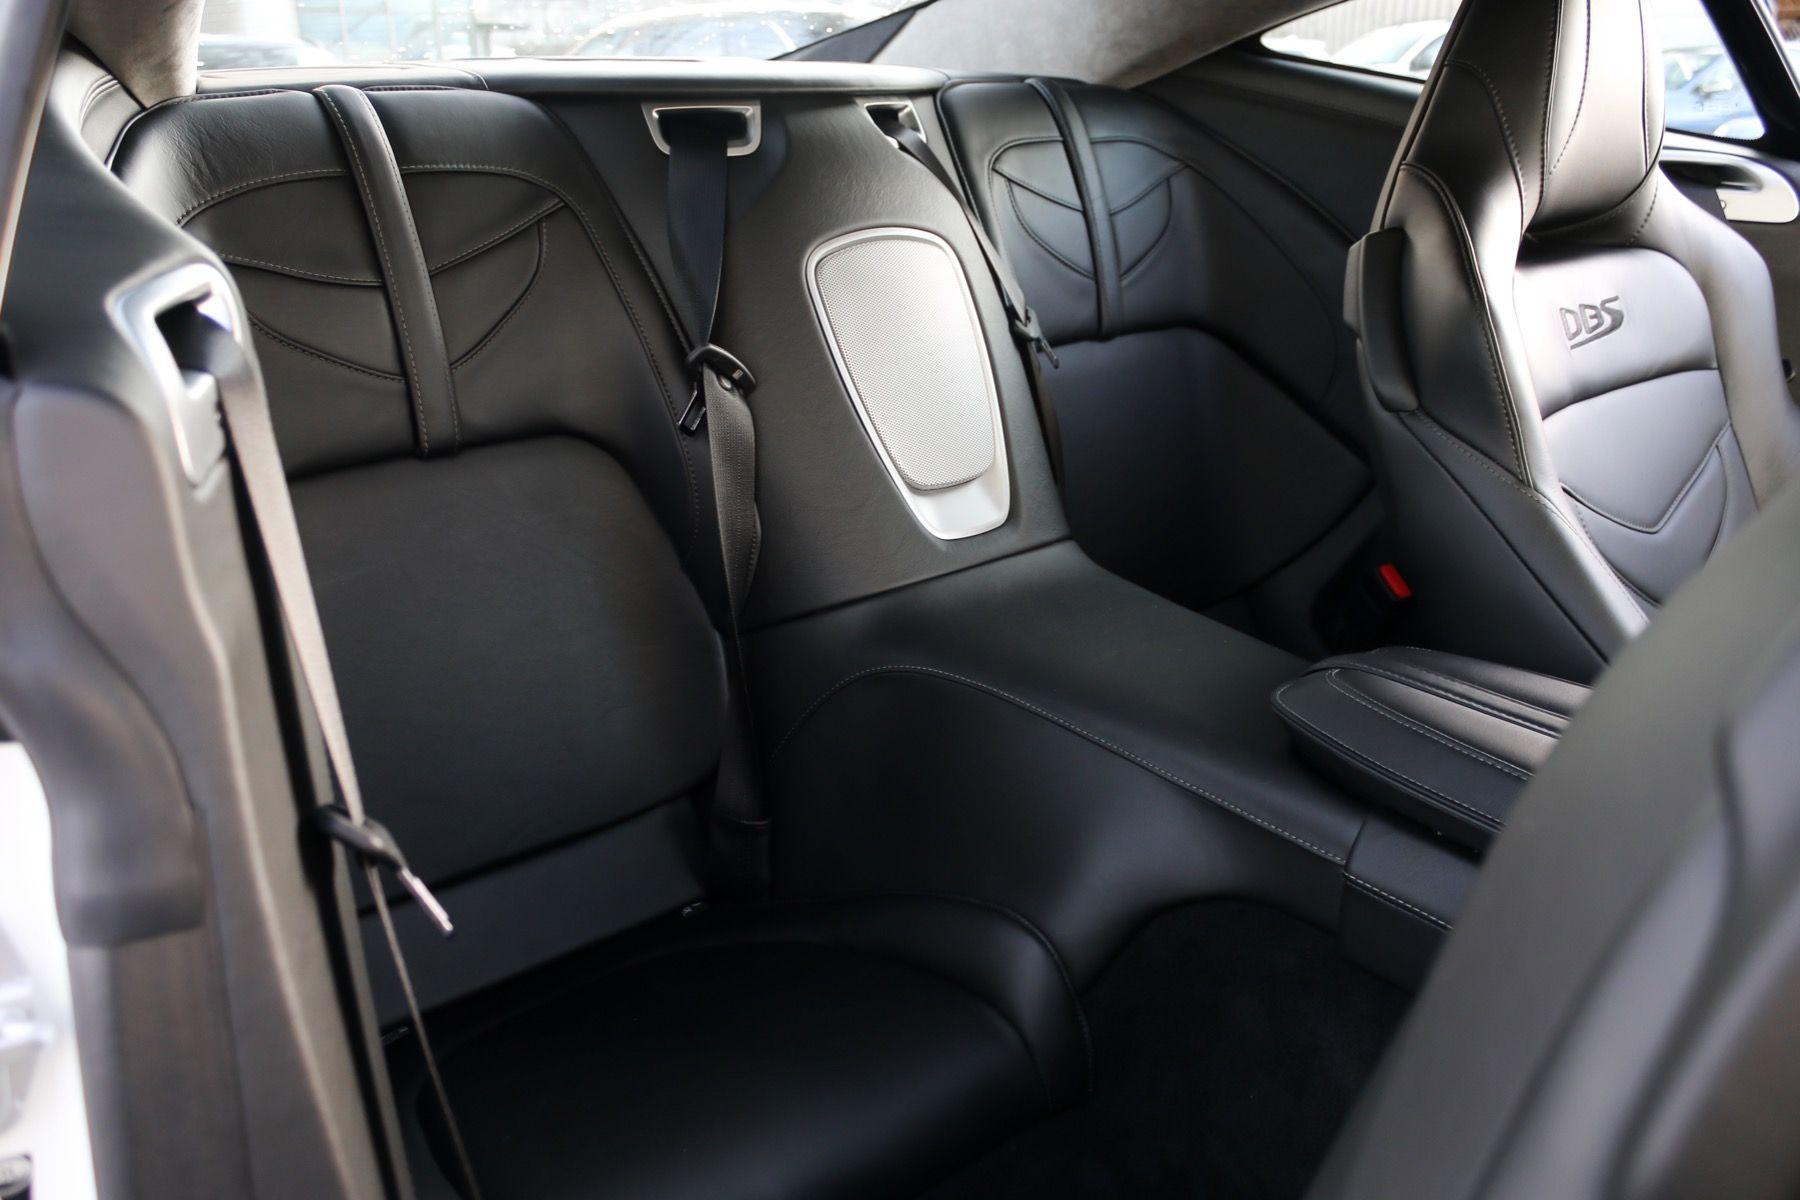 Aston Martin DBS V12 Superleggera 2dr Touchtronic image 33